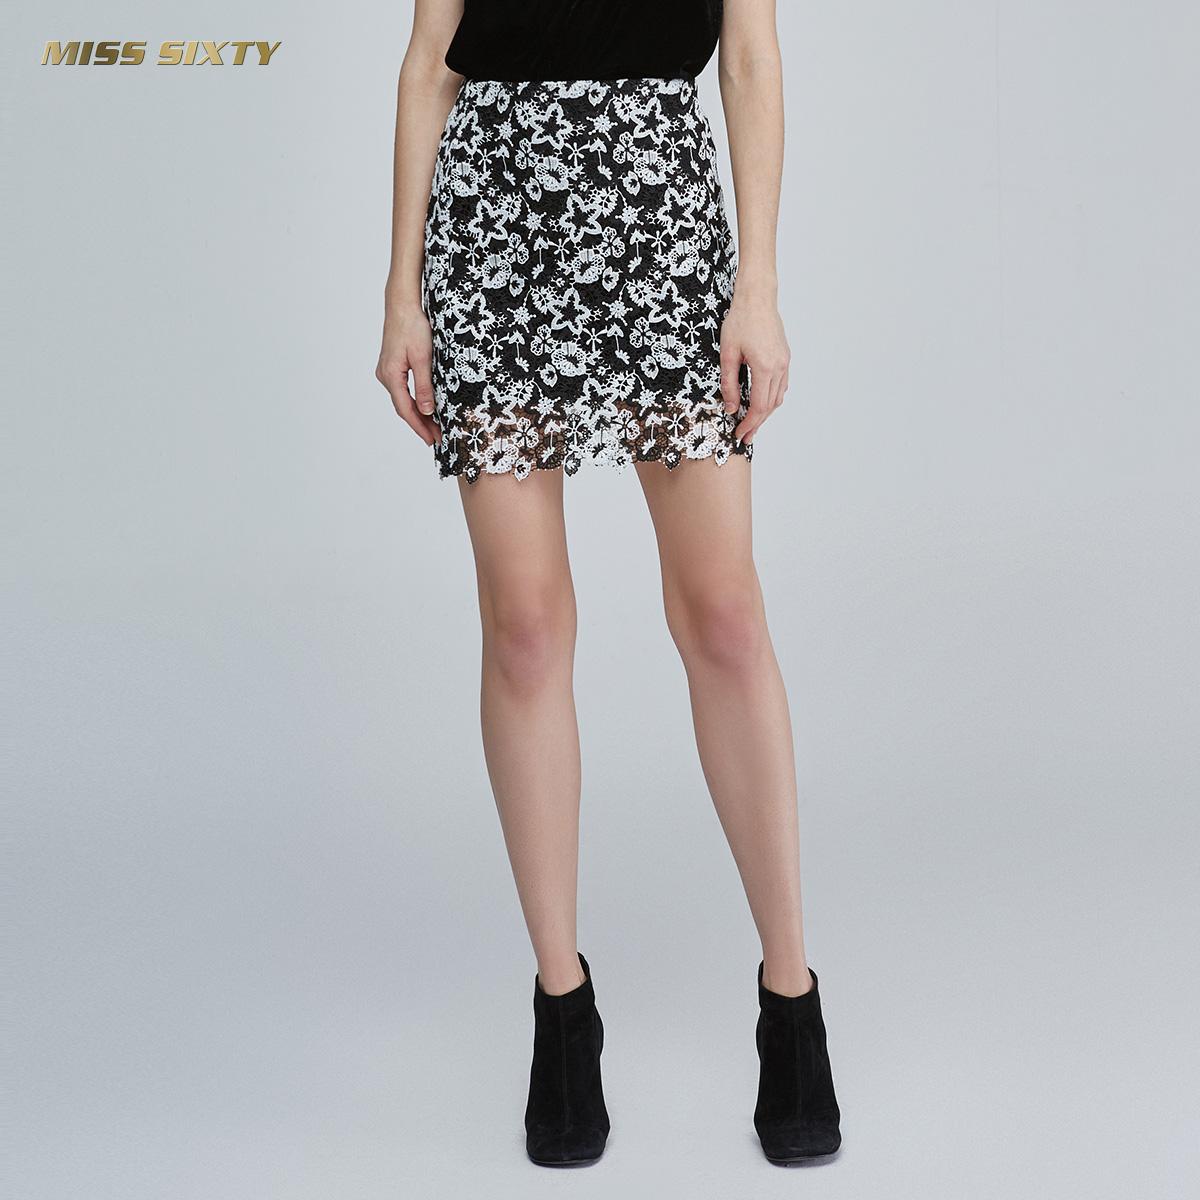 C Miss Sixty2018新款夏季短裙ins超火高腰半身裙女681KJ5581000